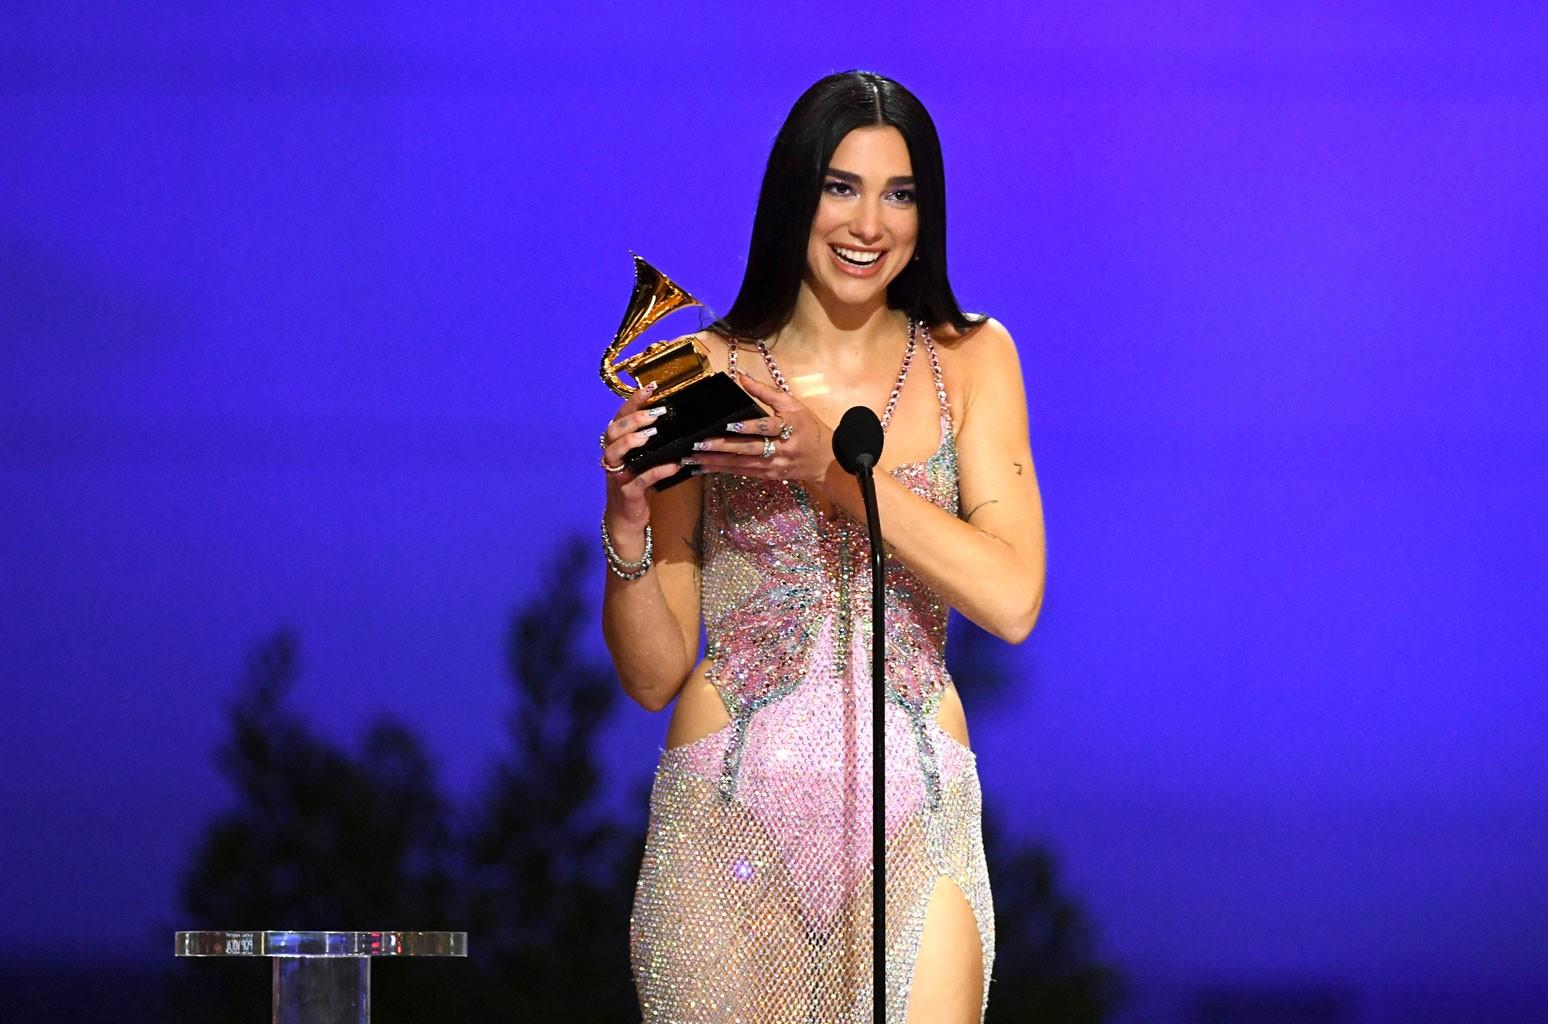 Dua Lipa's 'Future Nostalgia' Wins Best Pop Vocal Album at 2021 Grammy Awards